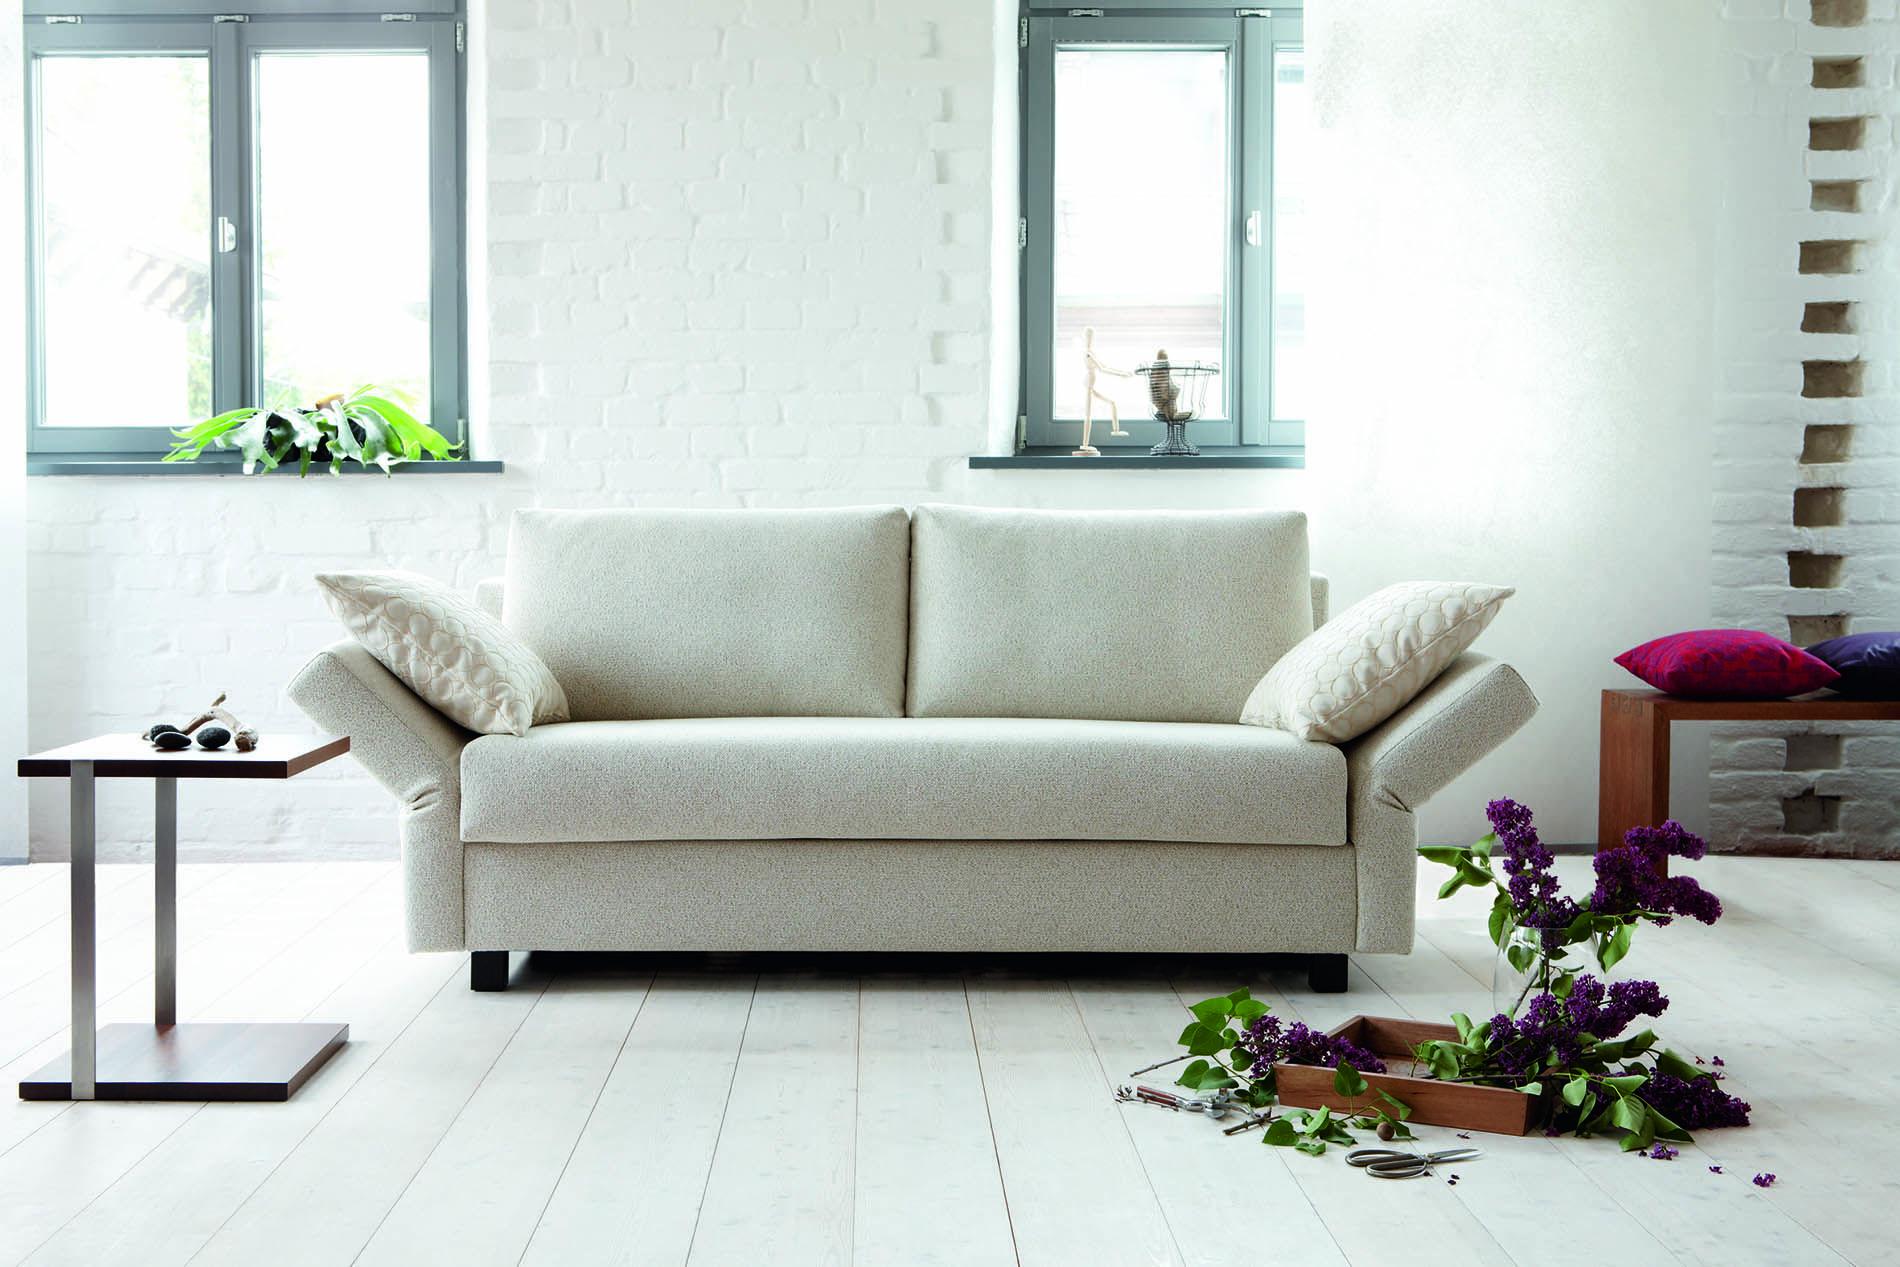 Bettsofa design  Das Schlafsofa Cuba von Signet. The sofabed Cuba from Signet ...